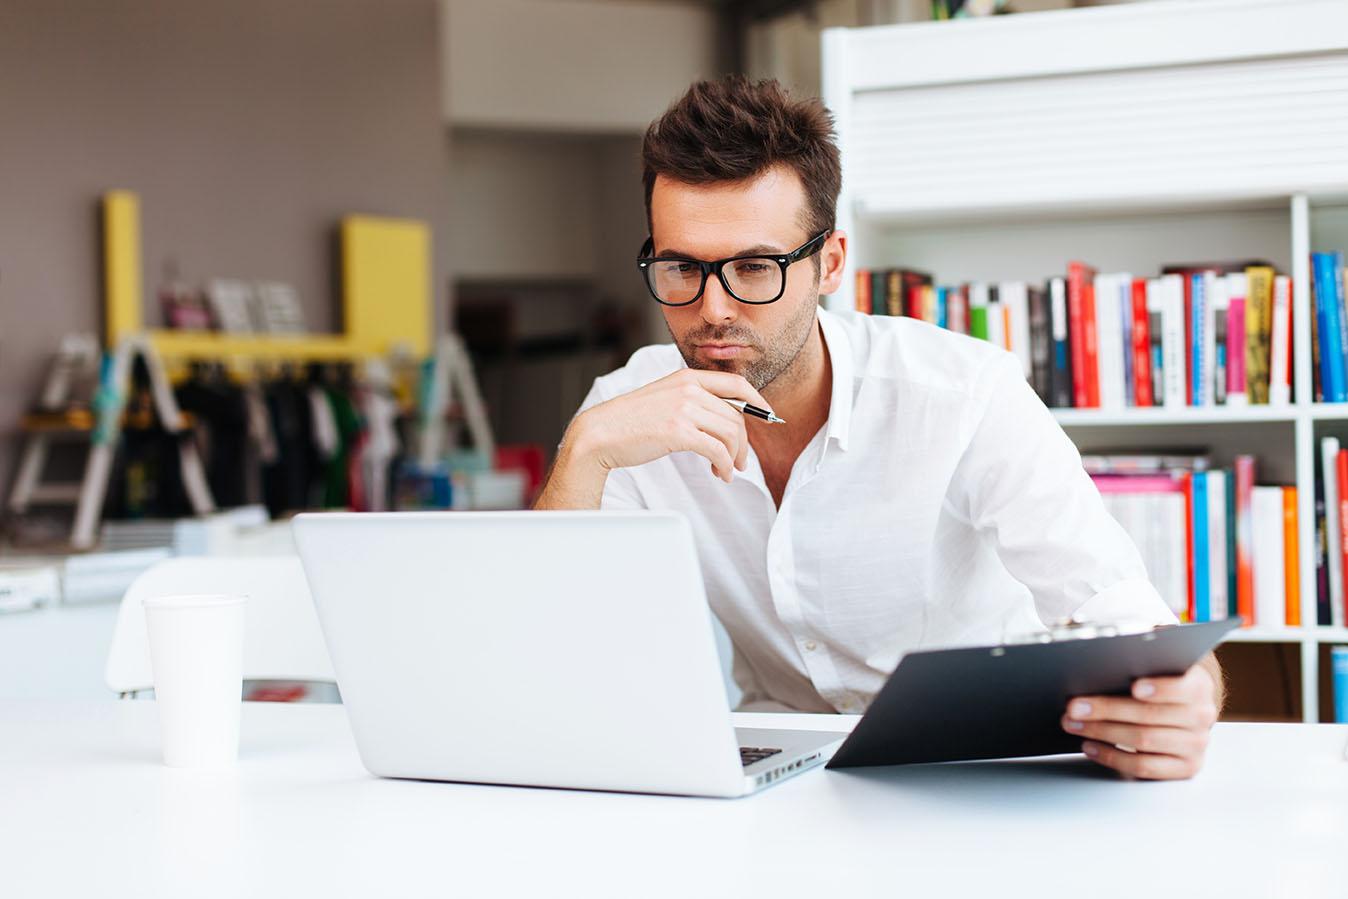 man computer - Odontocon é Digital